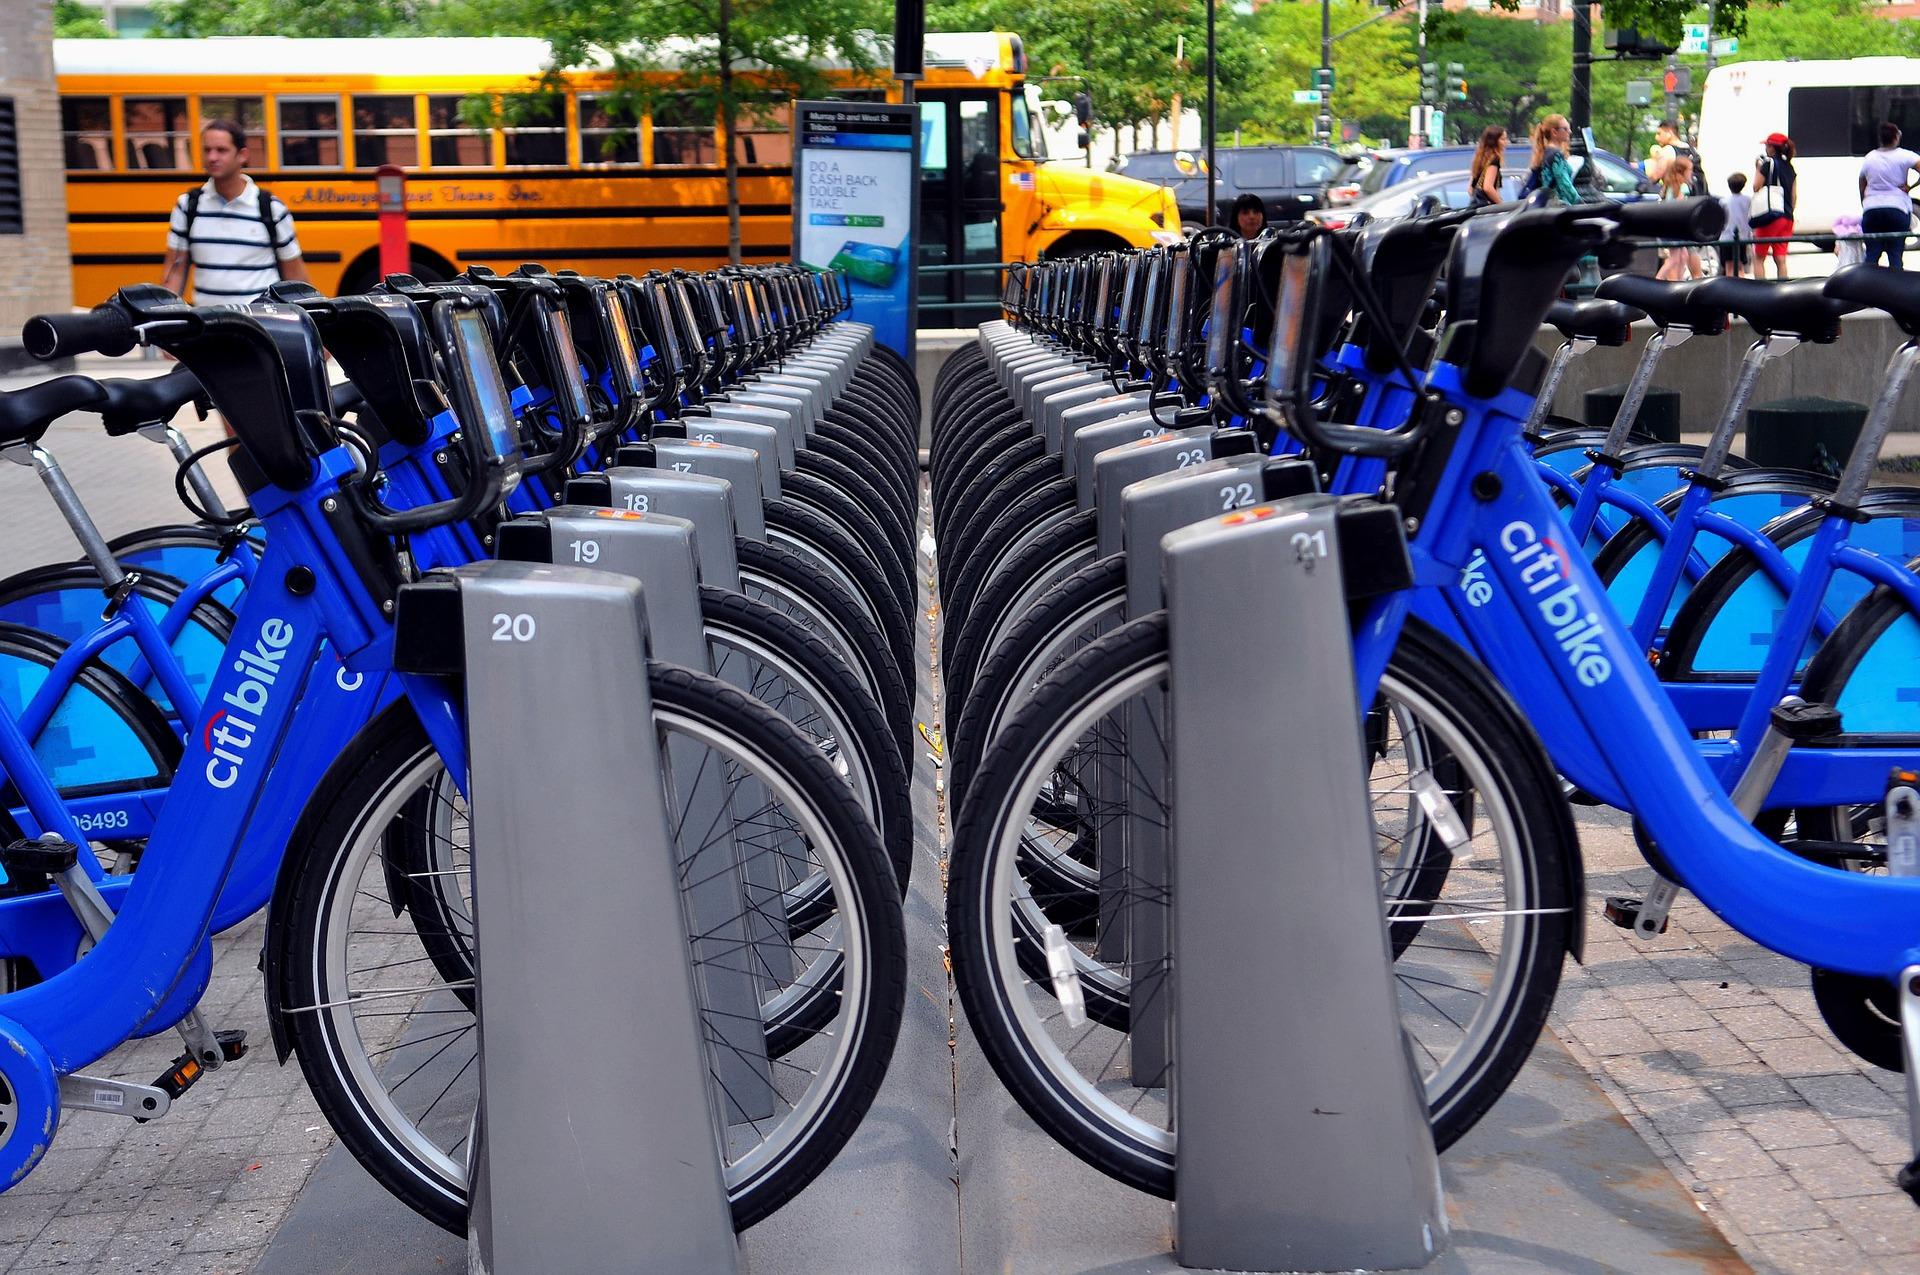 Image: Citi Bike docking area full of bikes